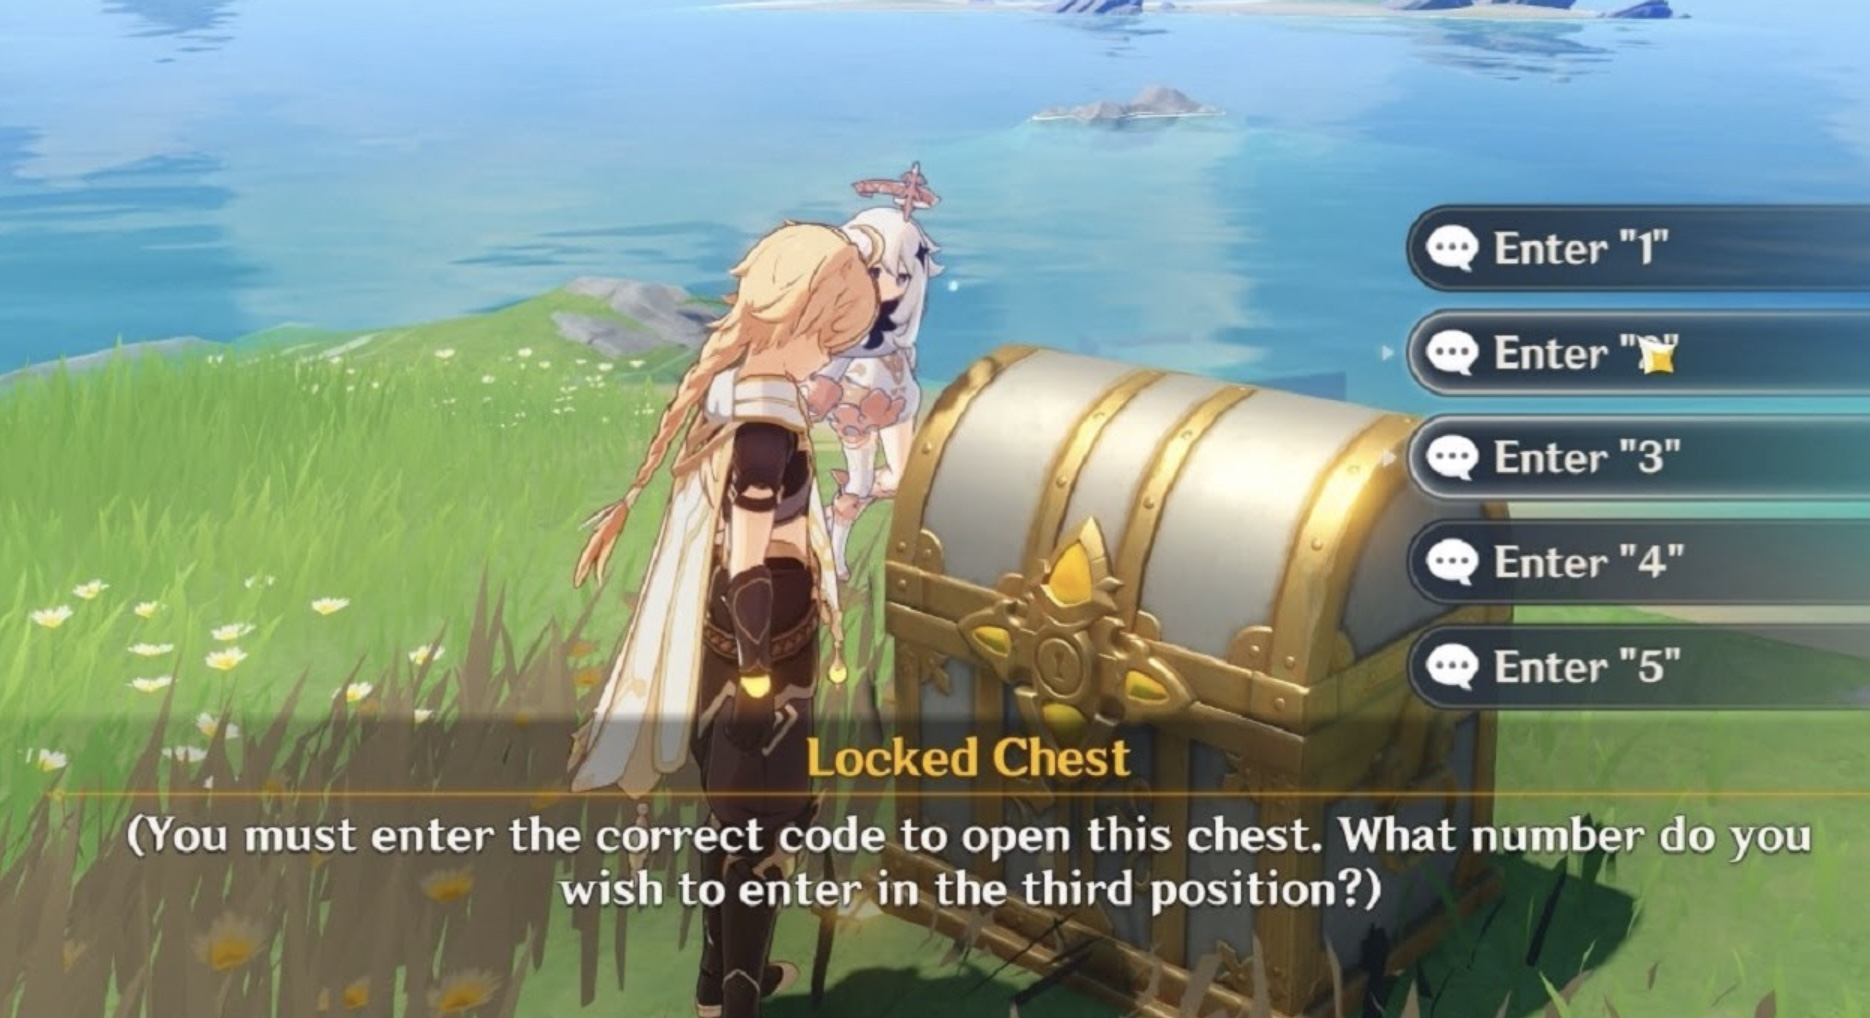 Locked Chest Code Genshin